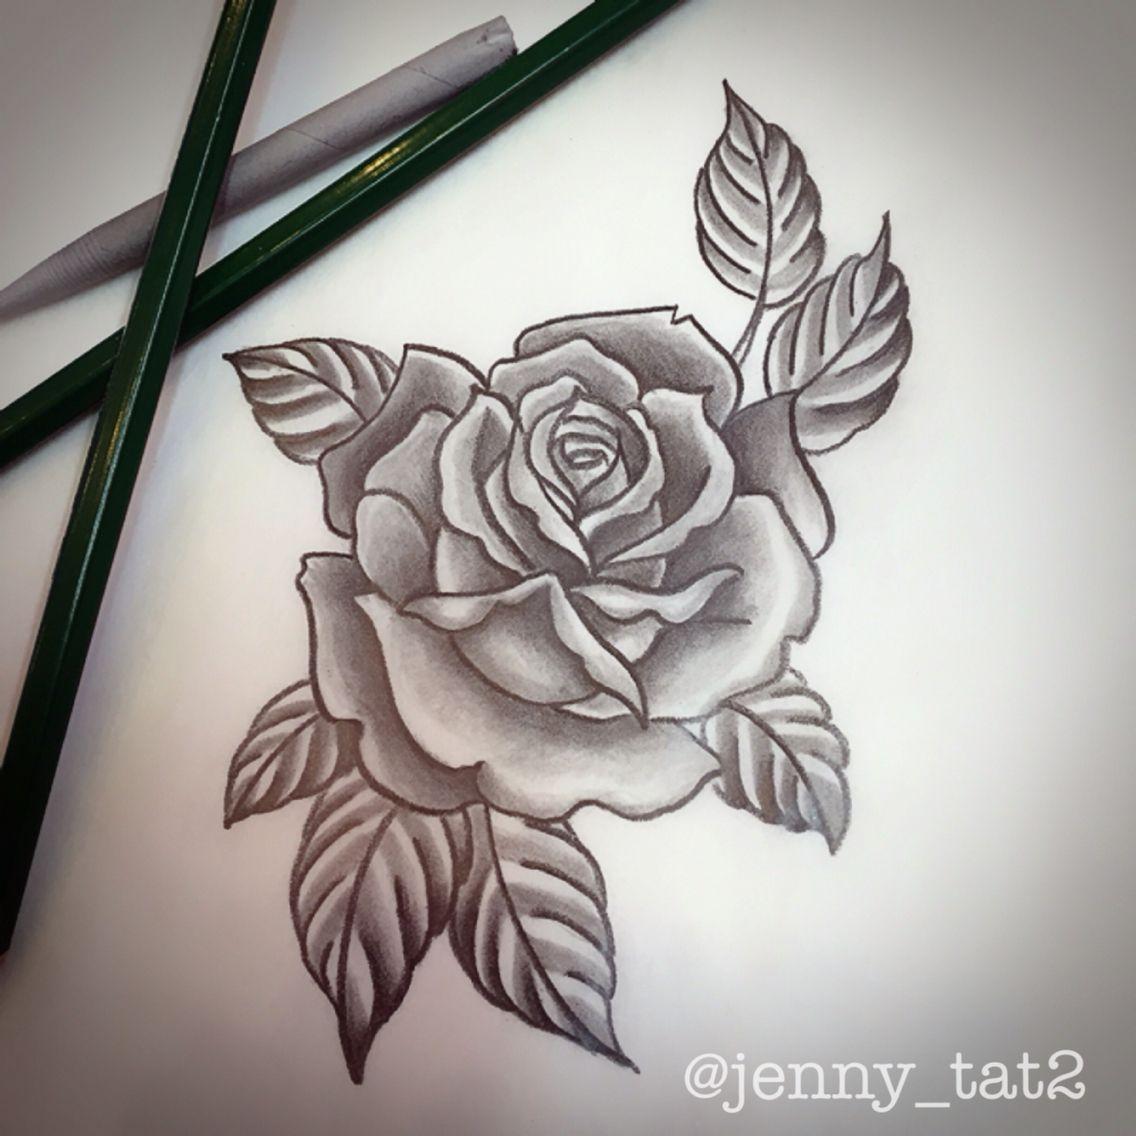 Love This Rose For A Tattoo Tattoos Tattoos Rose Tattoos